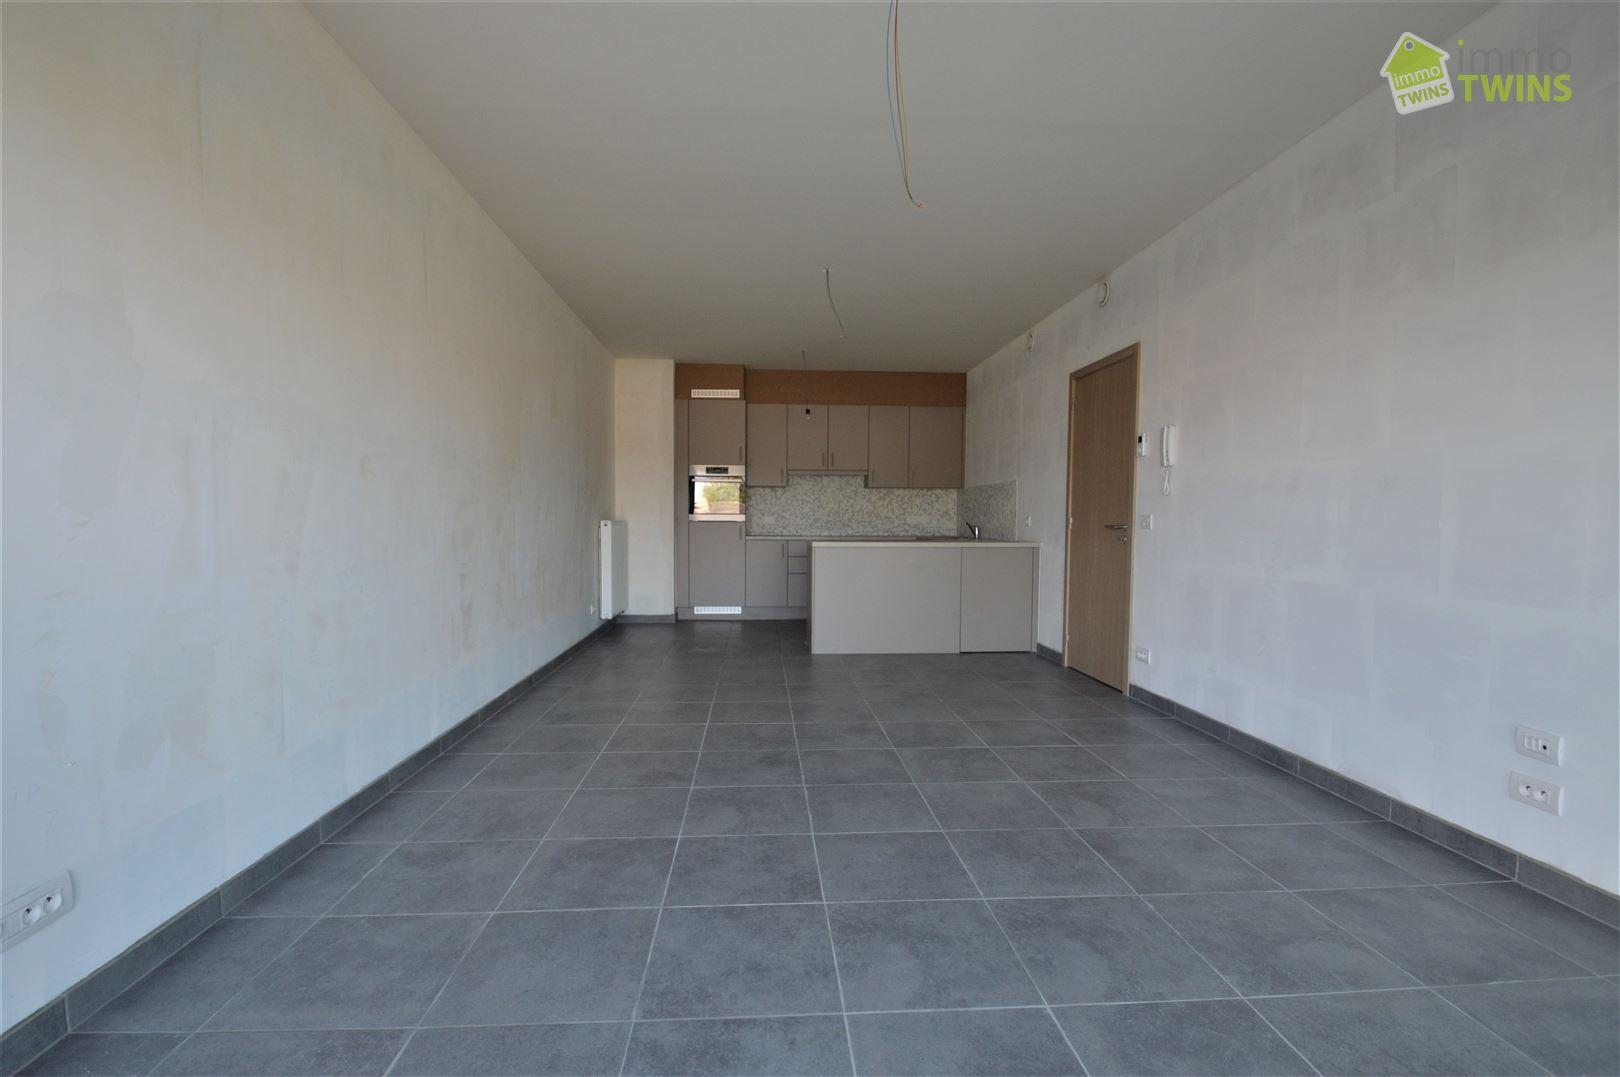 Foto 8 : Appartement te 9160 LOKEREN (België) - Prijs € 750